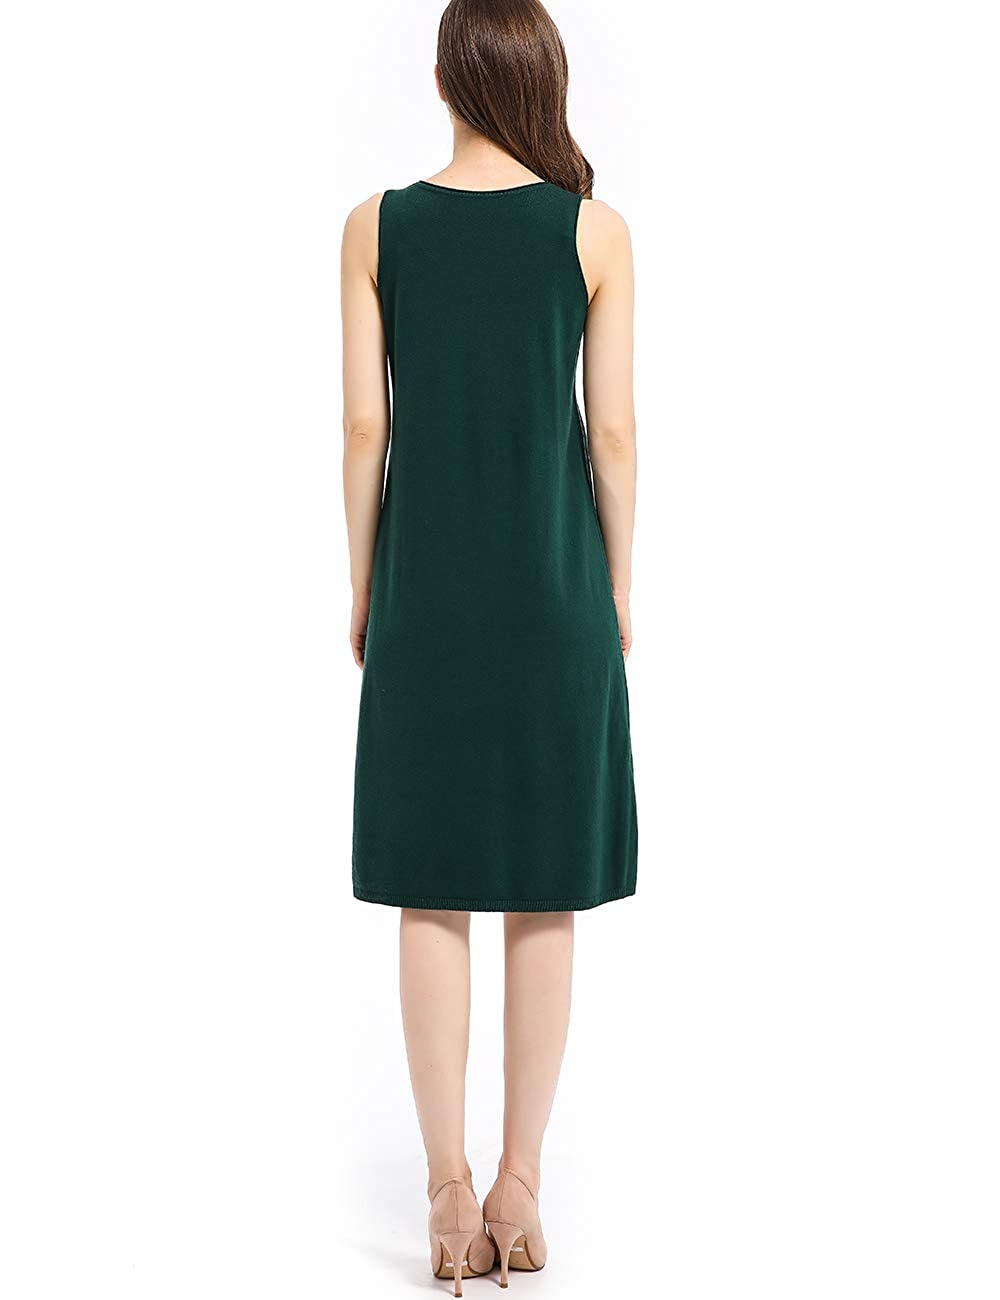 neezeelee Womens Dress Loose Casual Sleeveless Round Neck Comfortable Wool Sweater Vests